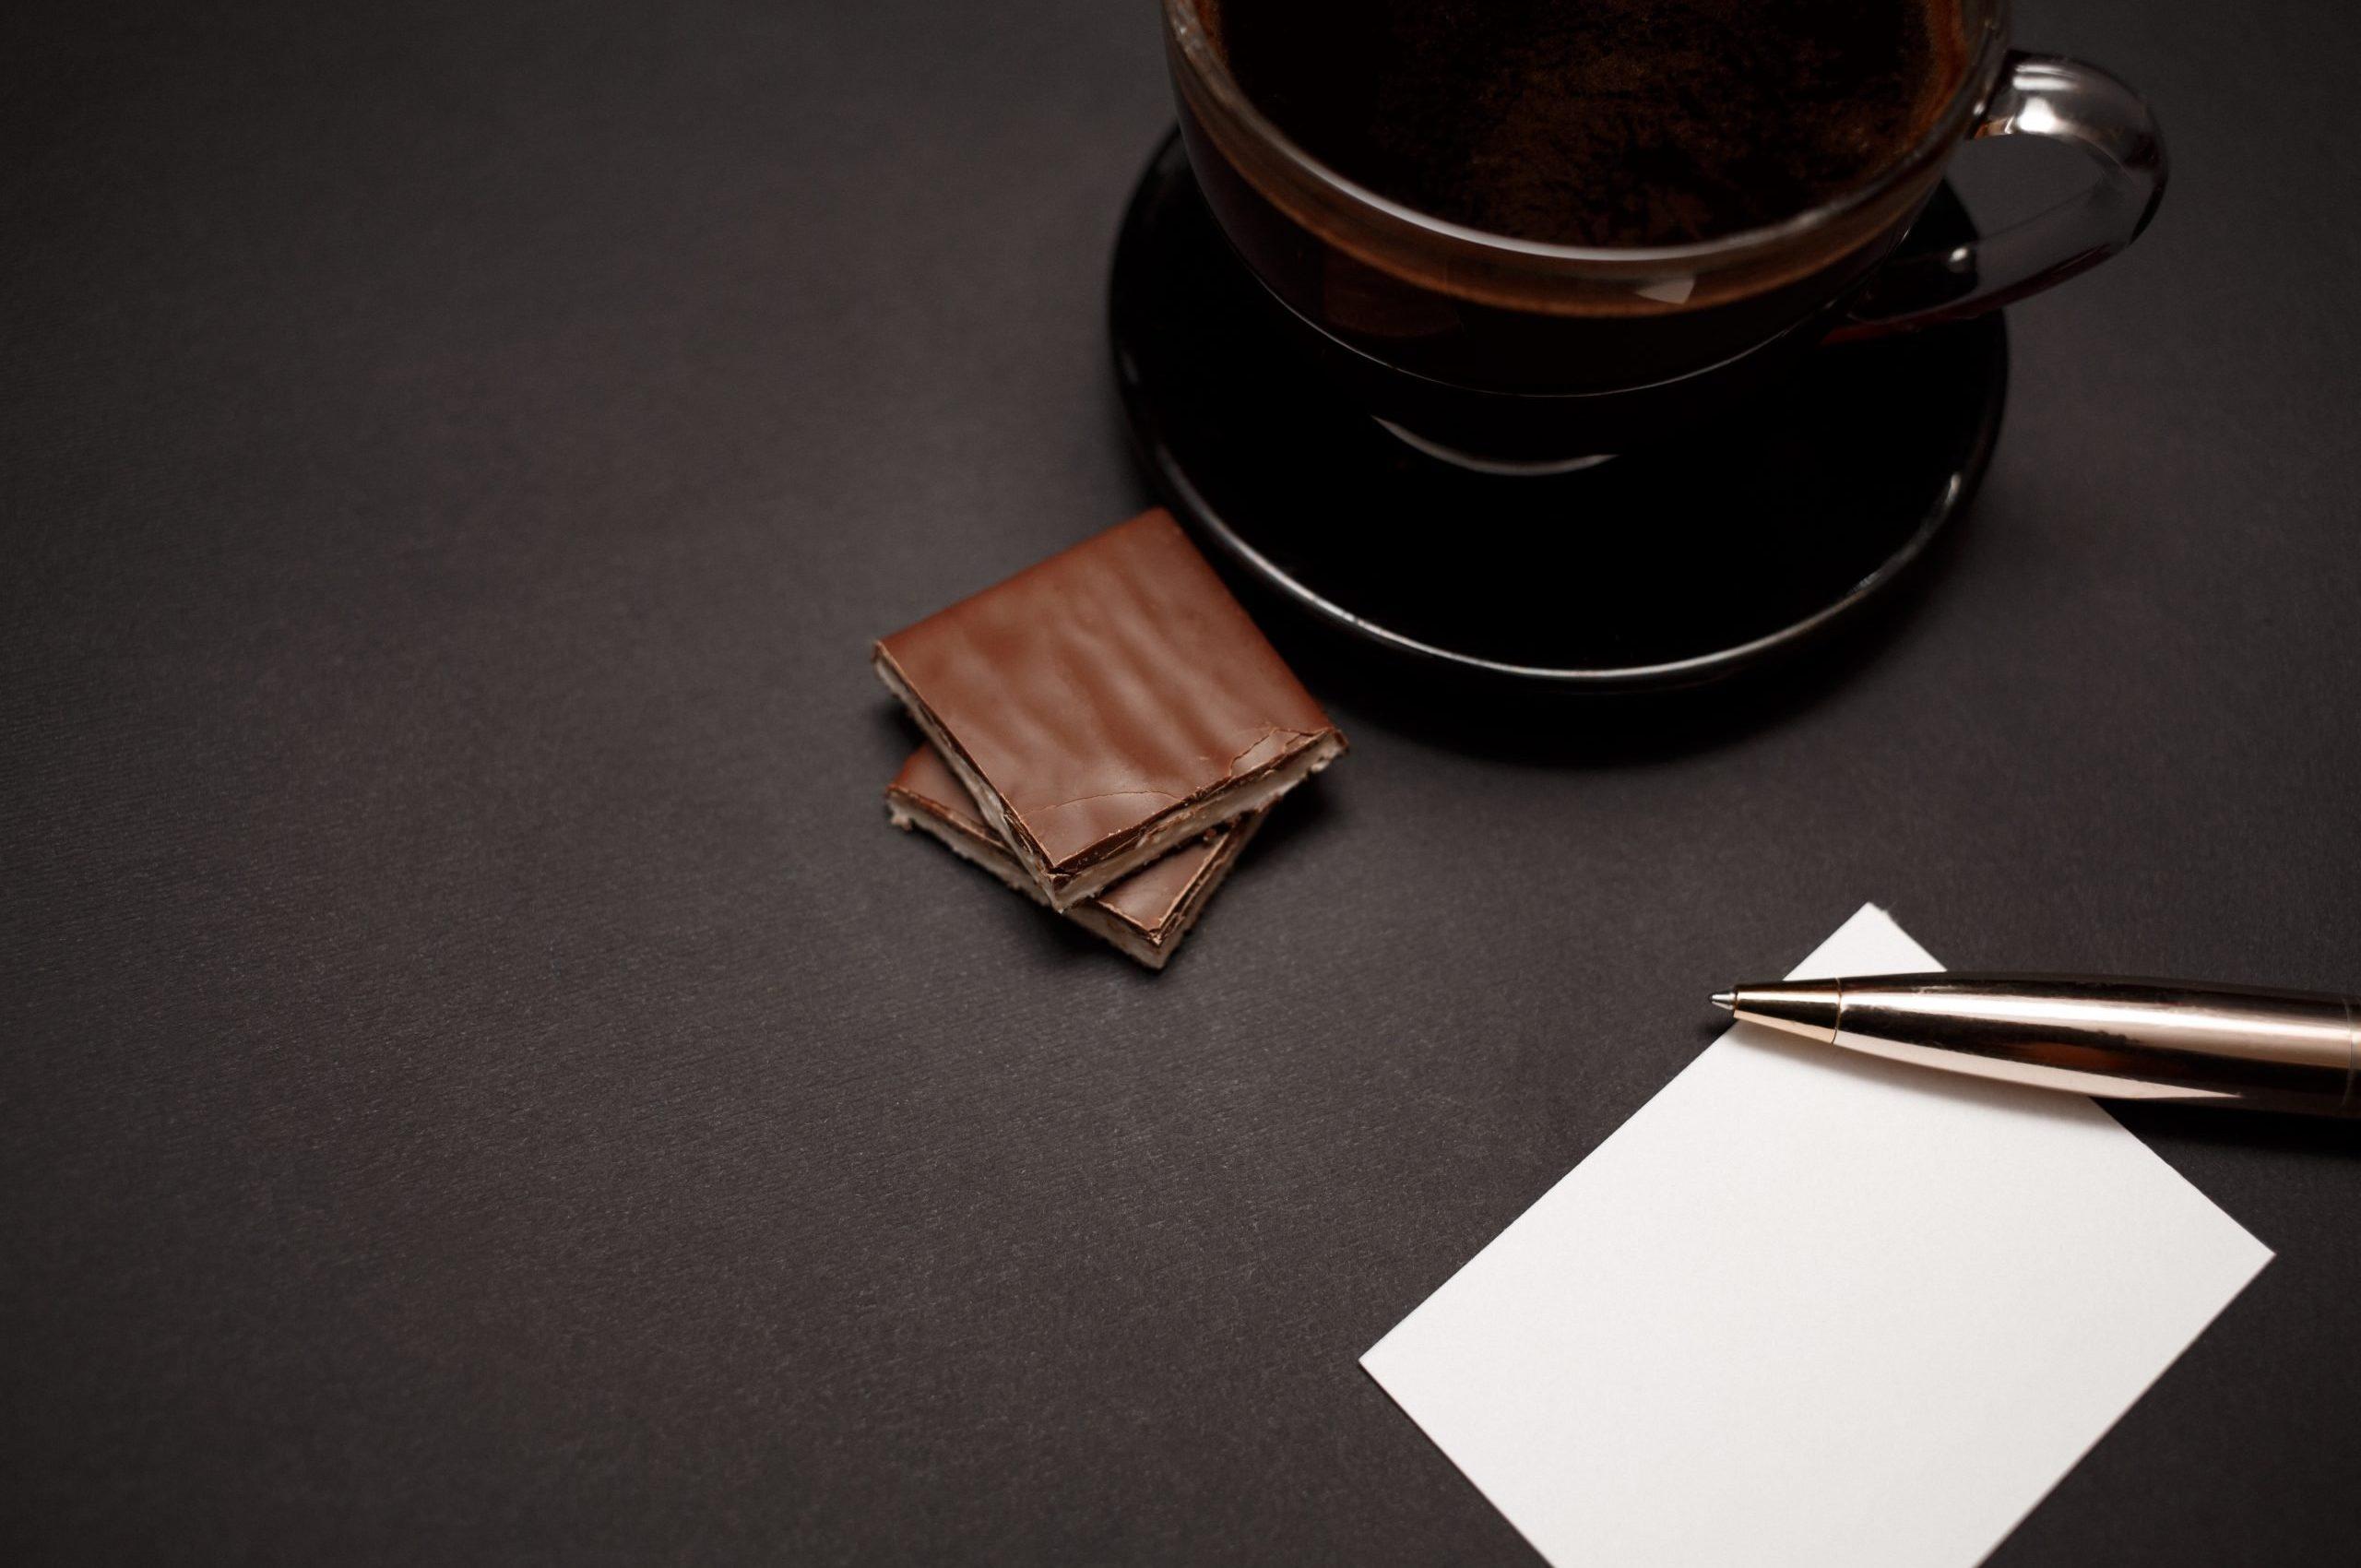 rmda-ss-retail-fragrant-coffee-transparent-cup-chocolates-dark-background.5760.3840